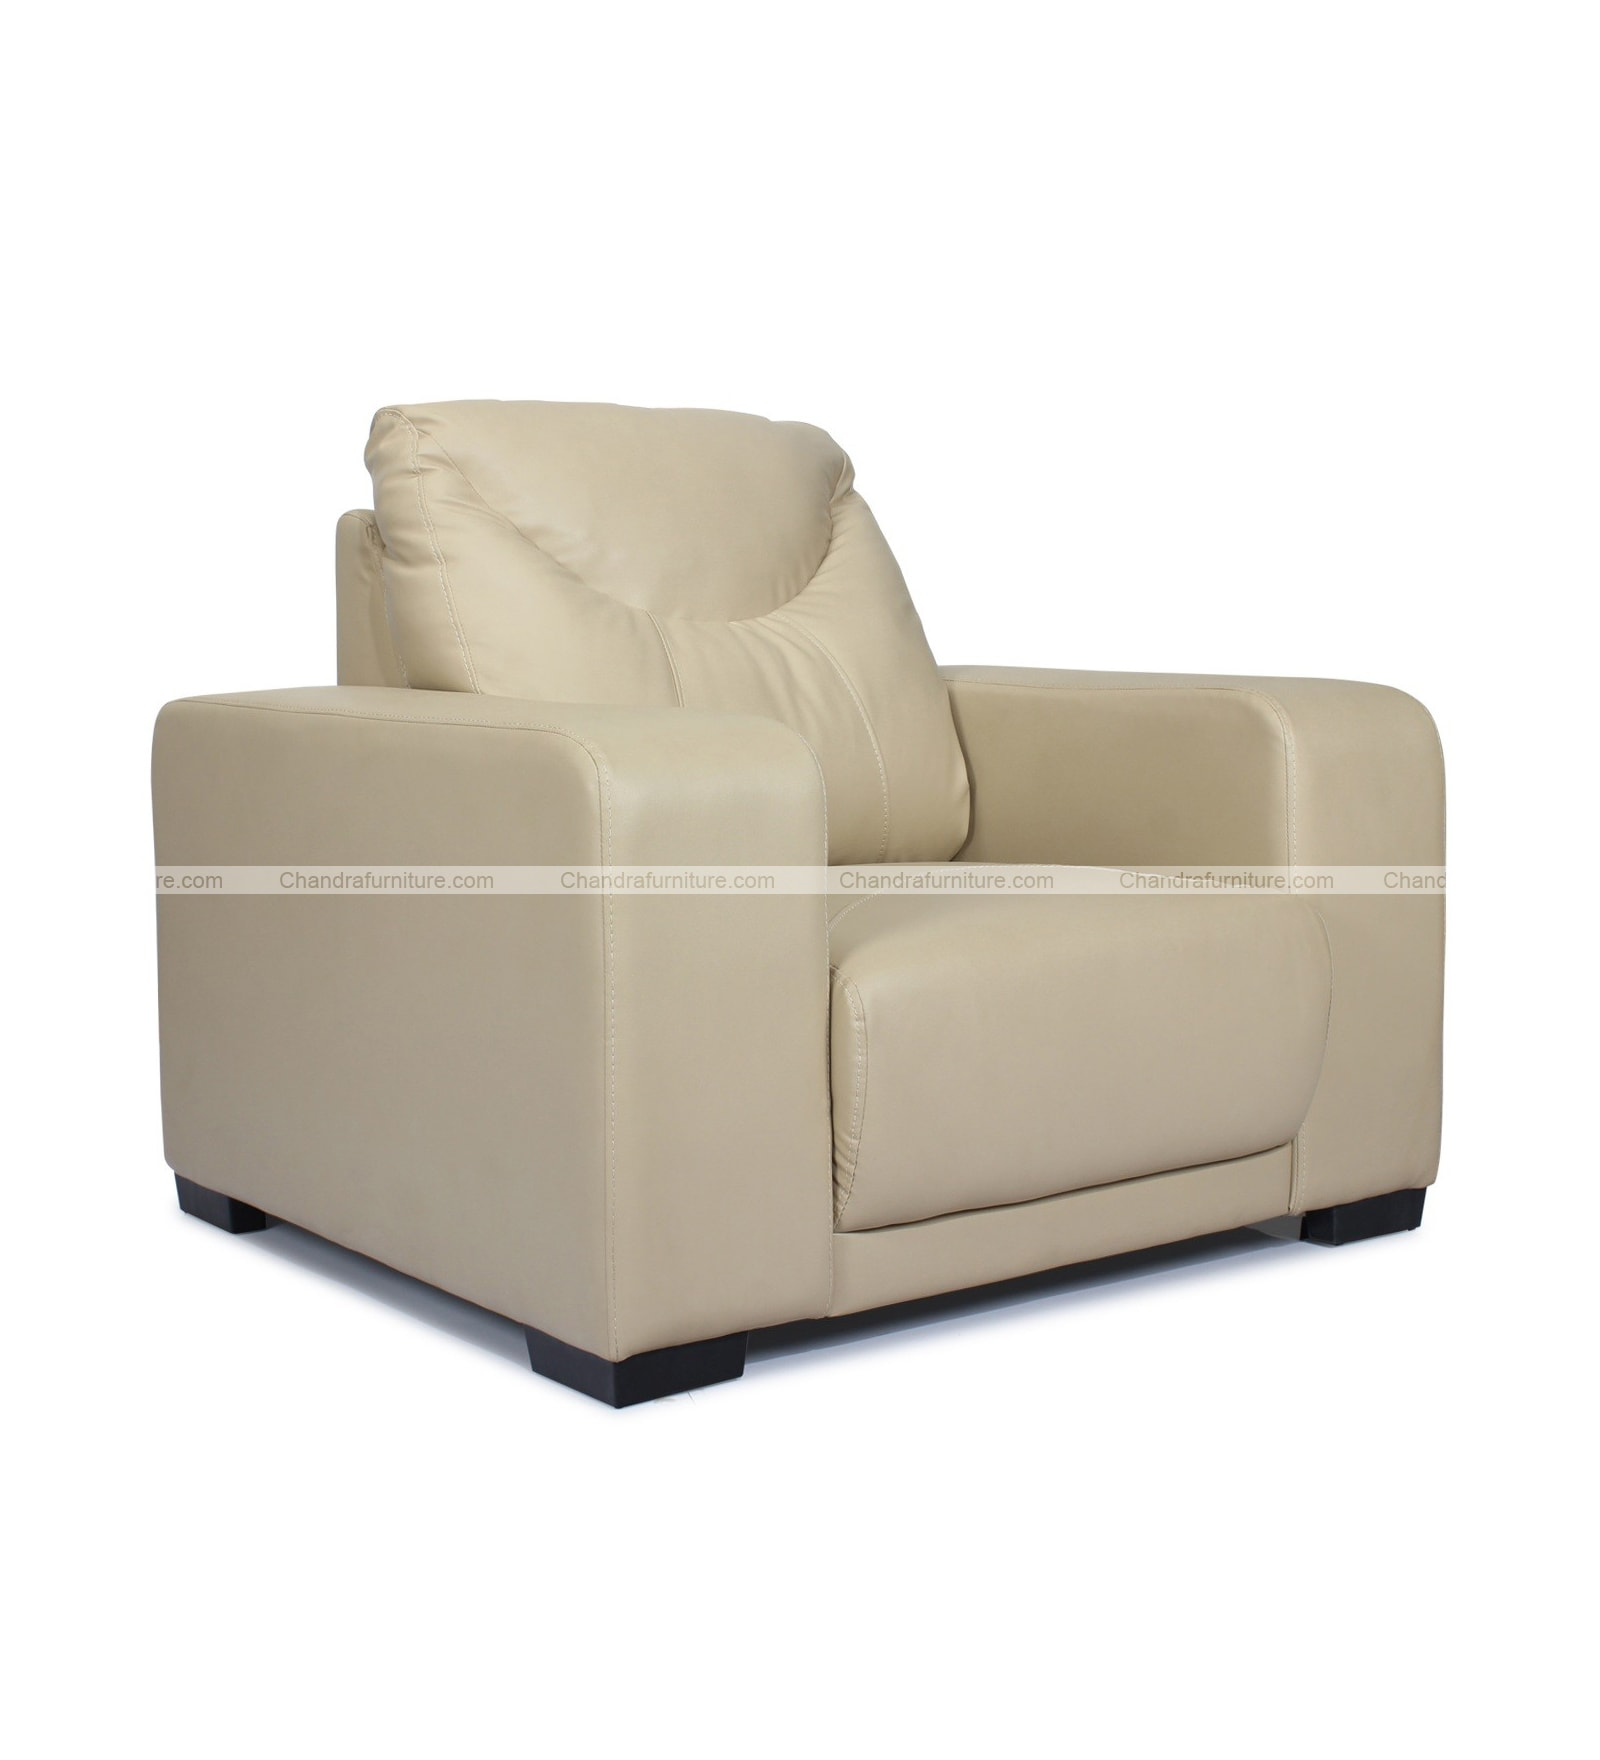 Chandra Furniture Resta Sofa Set In Lite Colour Lathrite